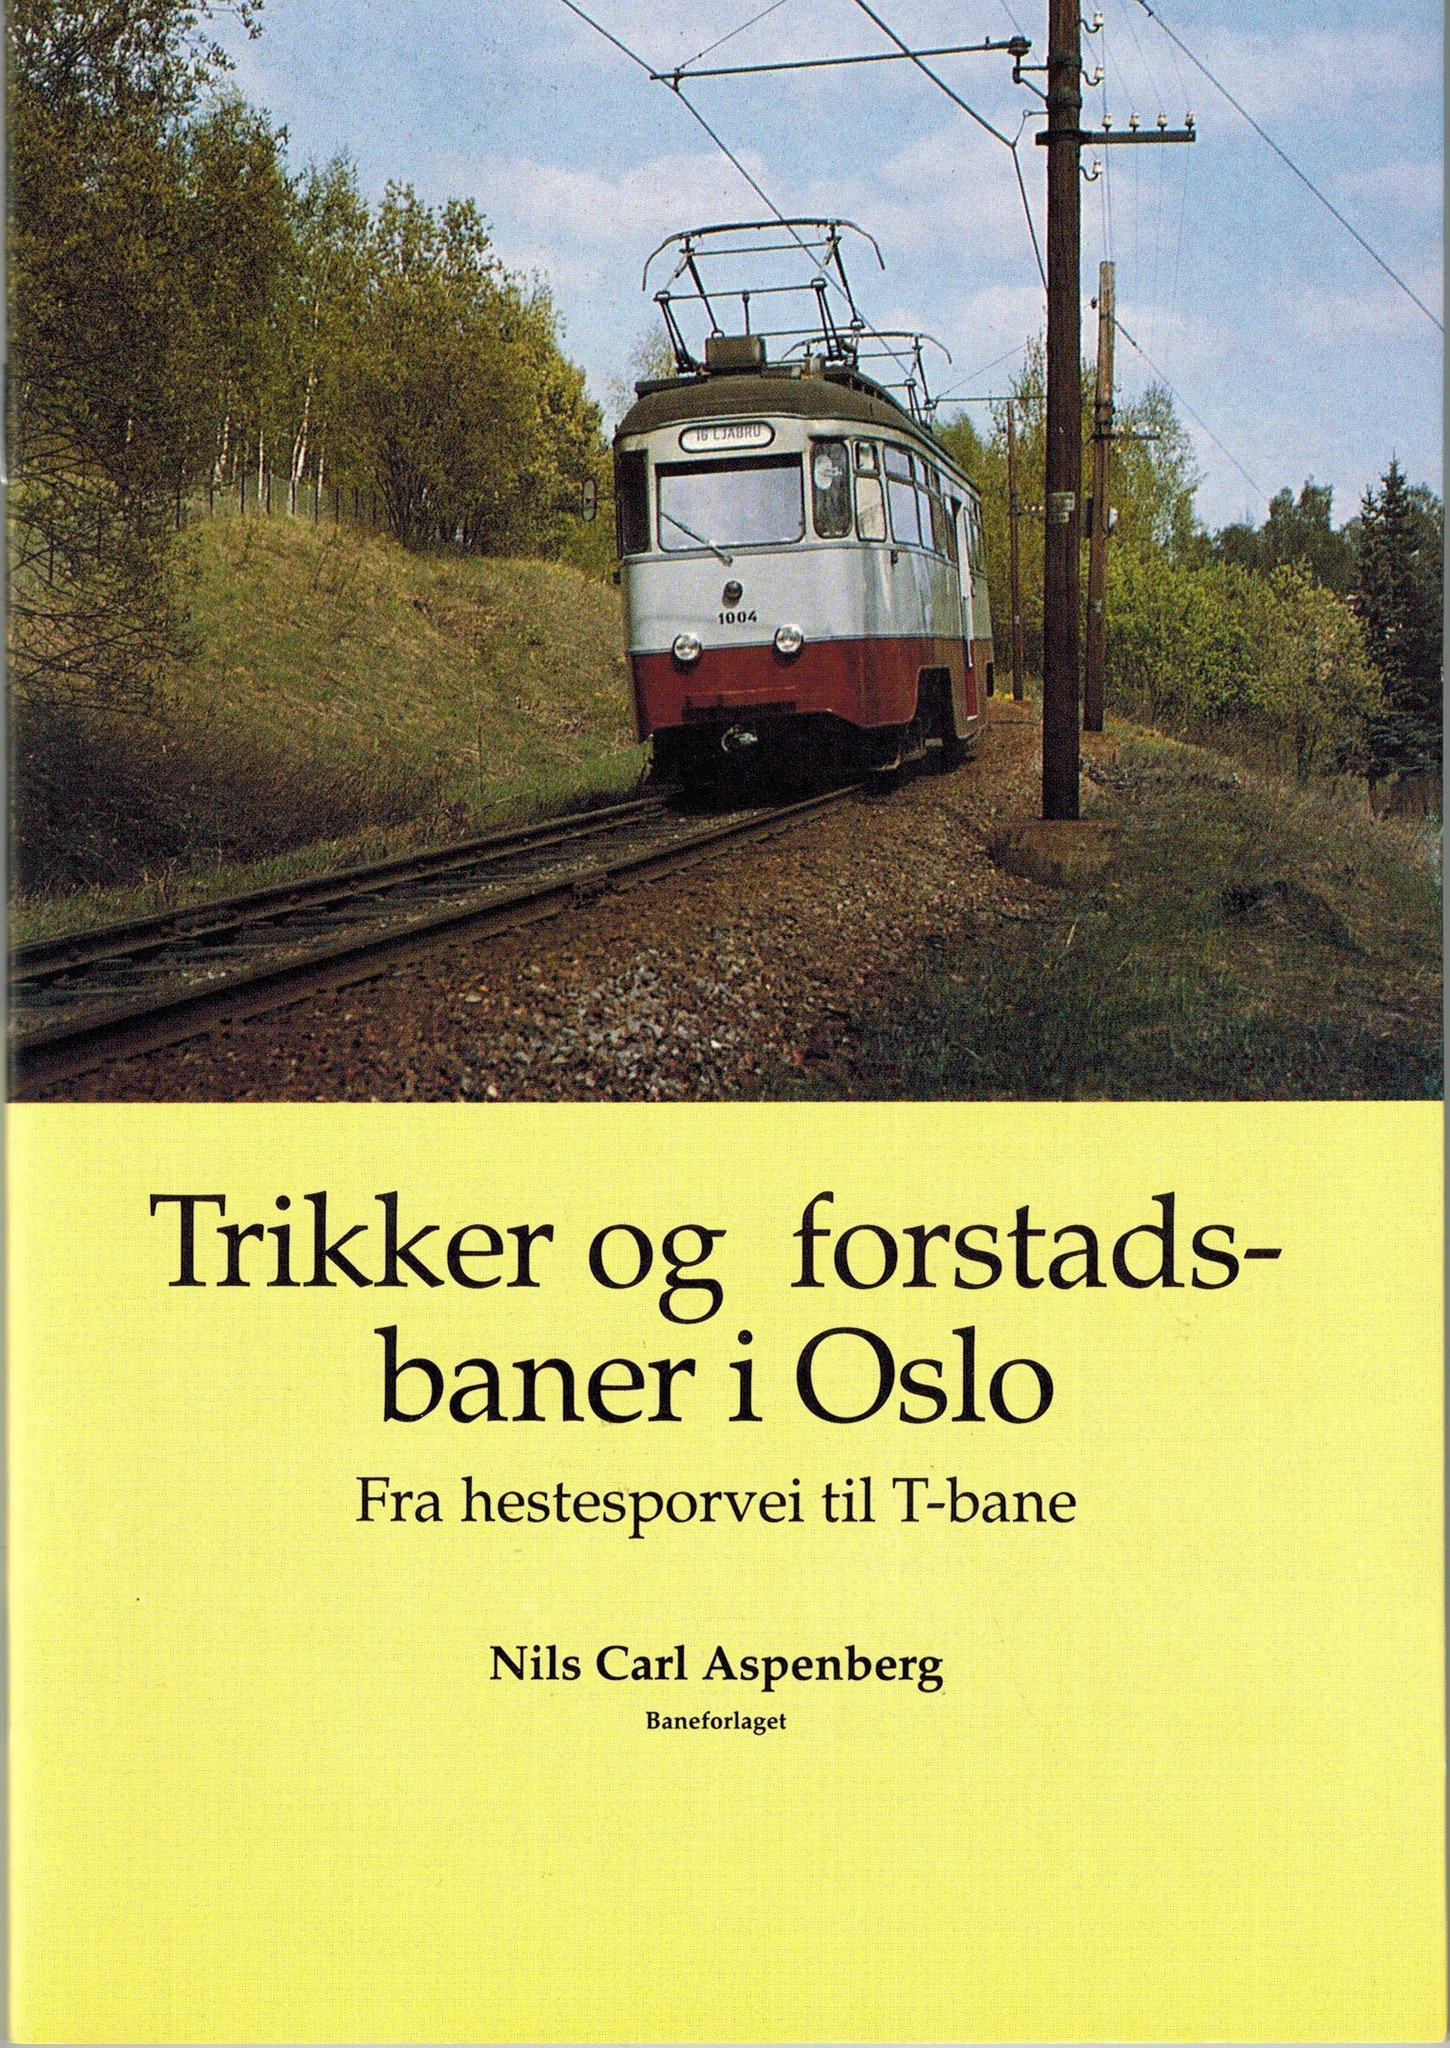 Trikker og forstadsbaner i Oslo